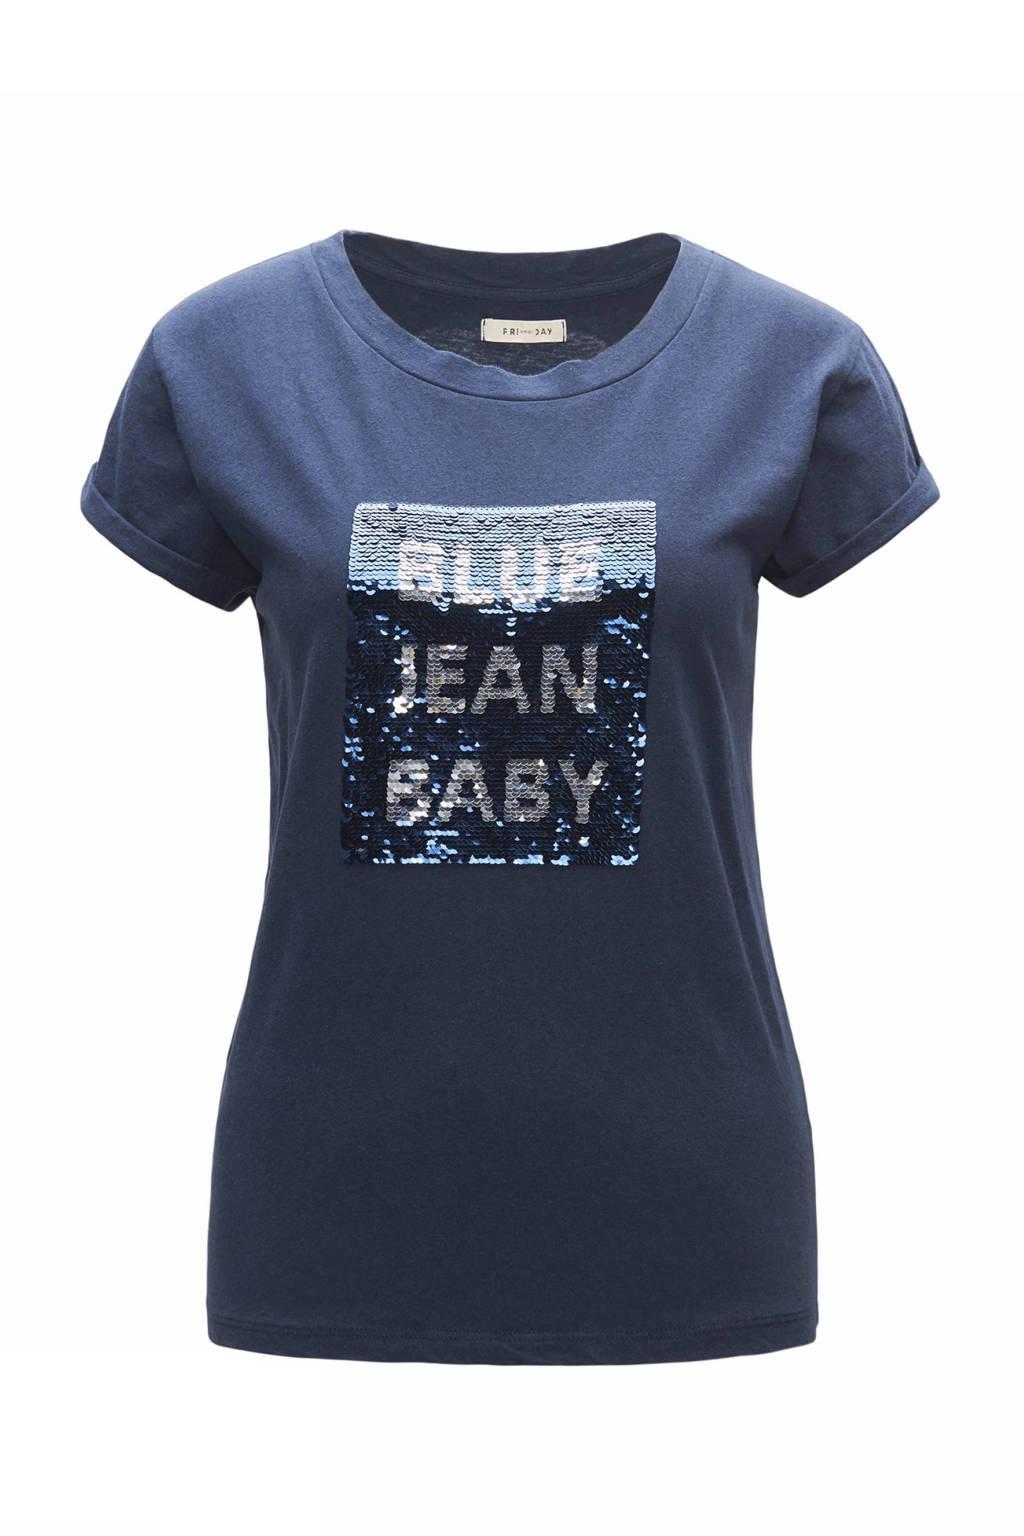 CKS Daisys T-shirt, Blauw